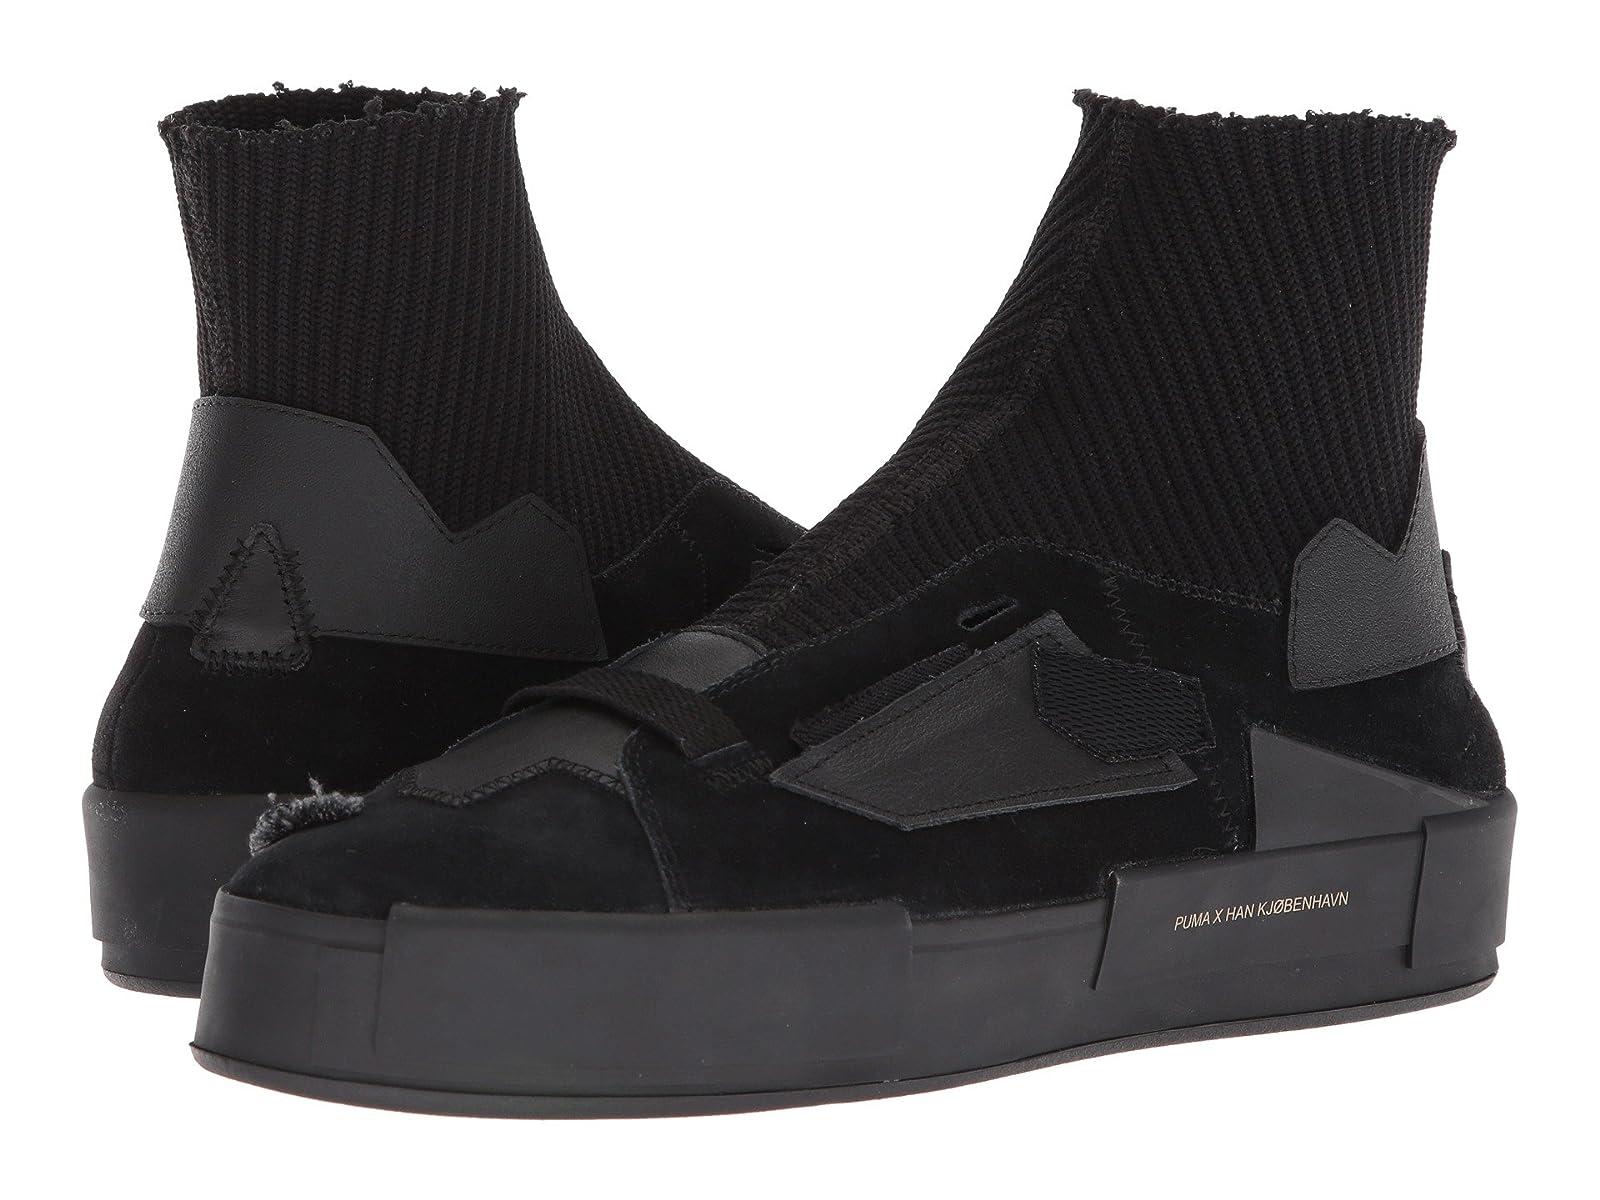 PUMA Puma x Han KJØBENHAVN Court Platform SneakerAtmospheric grades have affordable shoes